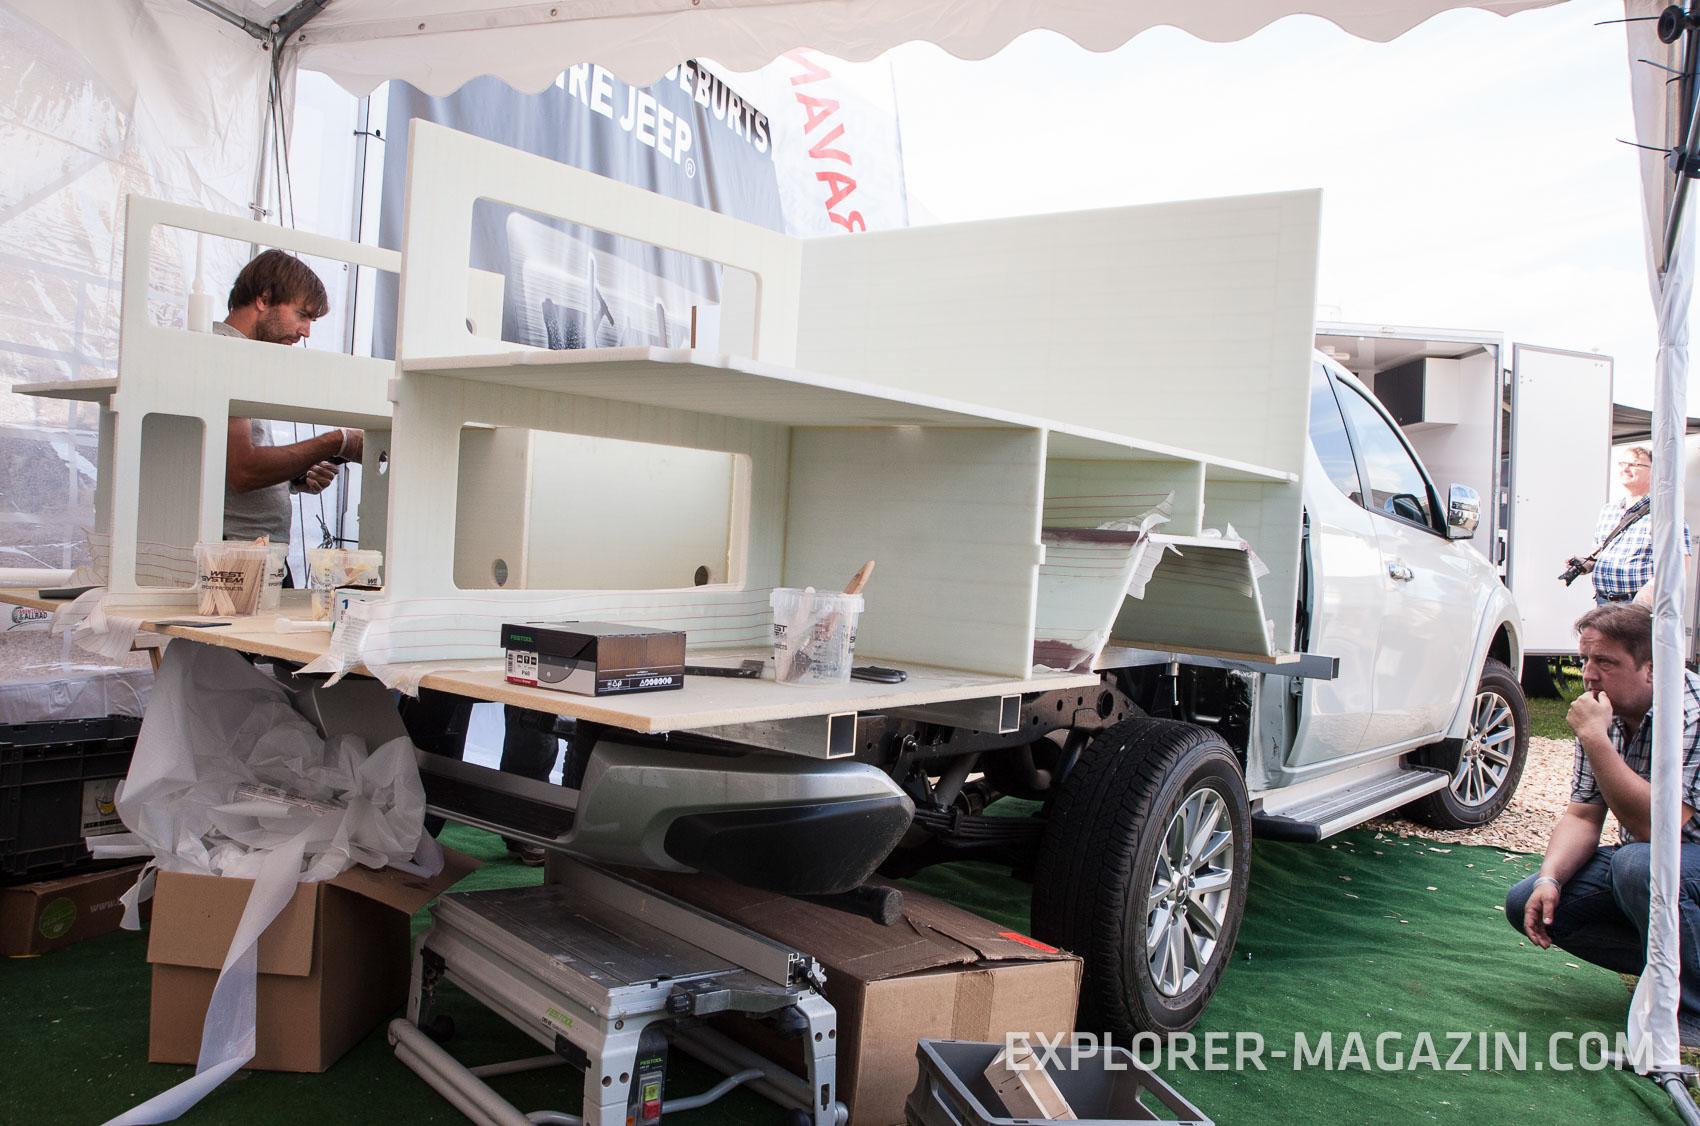 pickup kabine selbst bauen ursa minor ein projekt des explorer. Black Bedroom Furniture Sets. Home Design Ideas